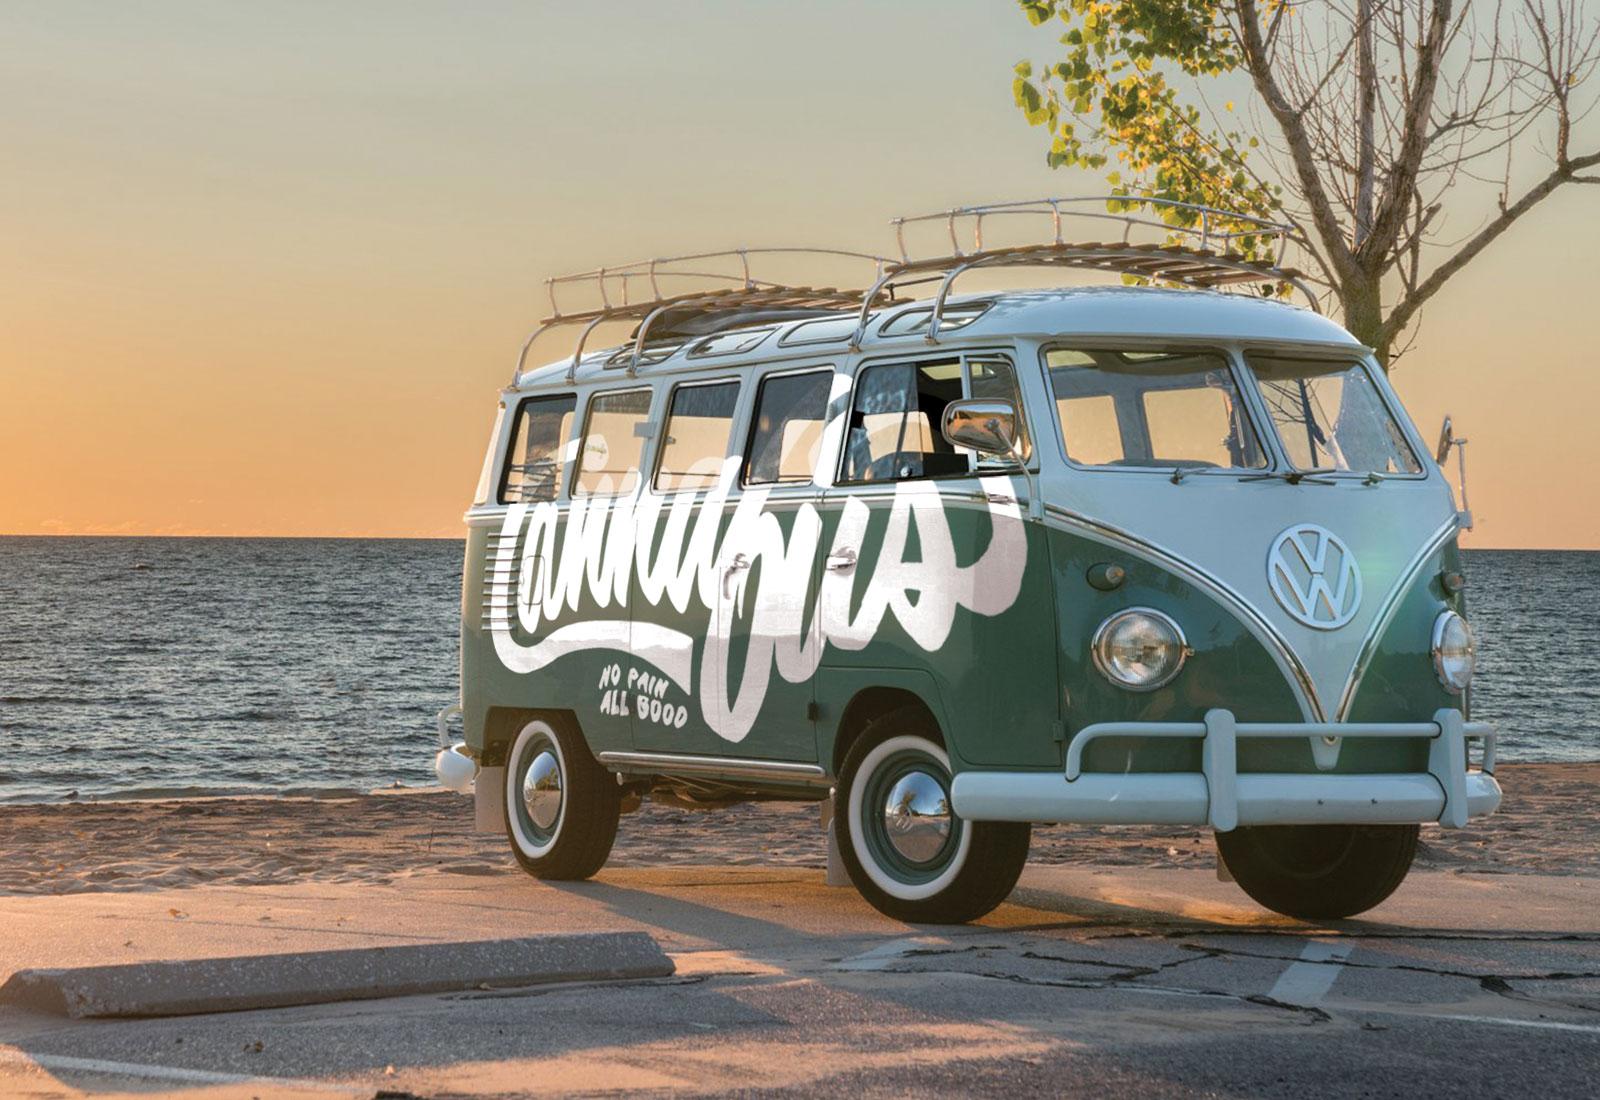 Cannabliss Dispensary VW Bus Swag Van